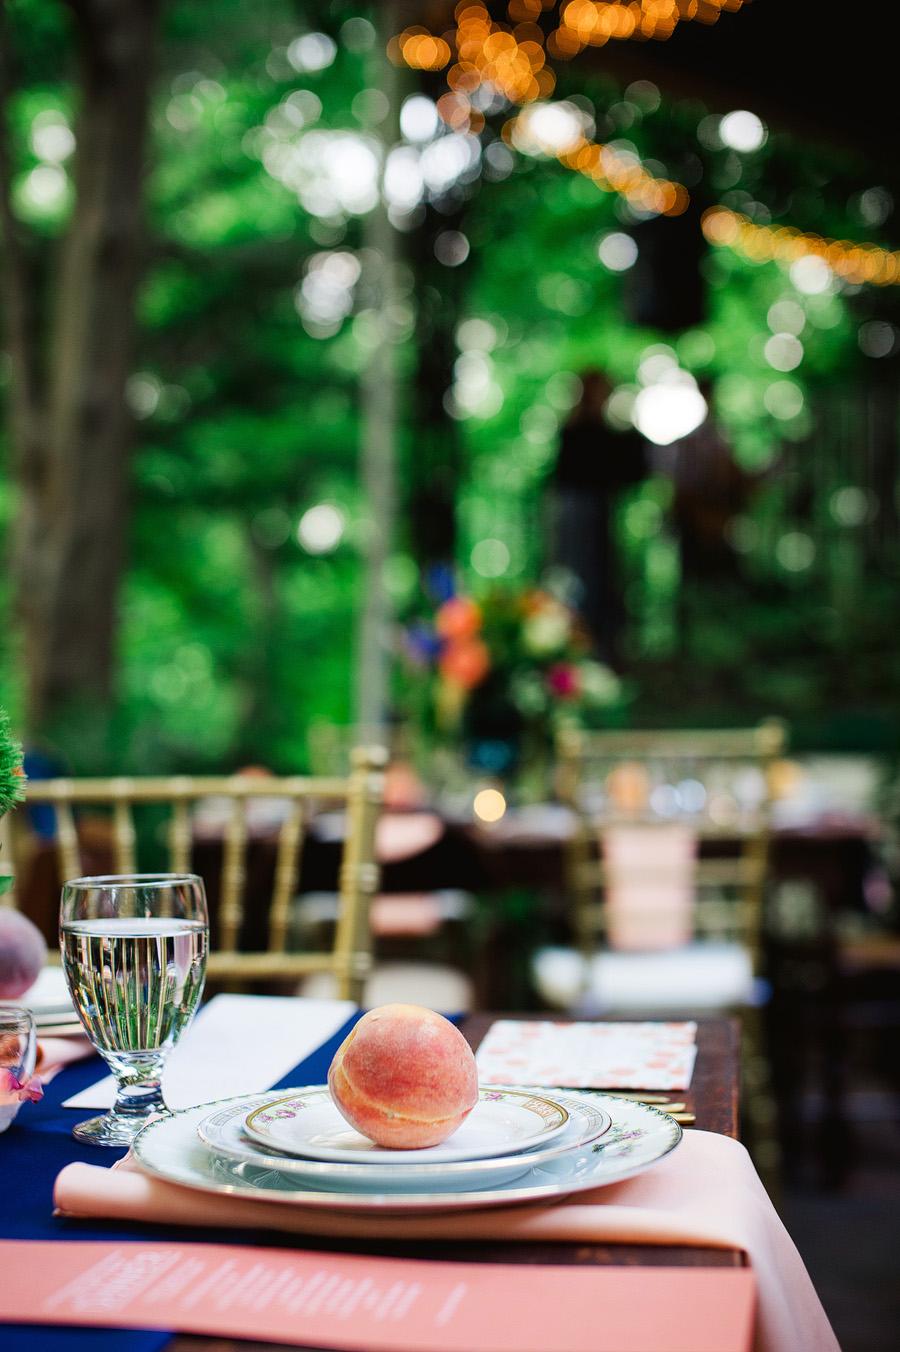 West-Chester-PA-Faunbrook-Harvest-Dinner-Series-Peach-AlexandraWhitney-190.jpg